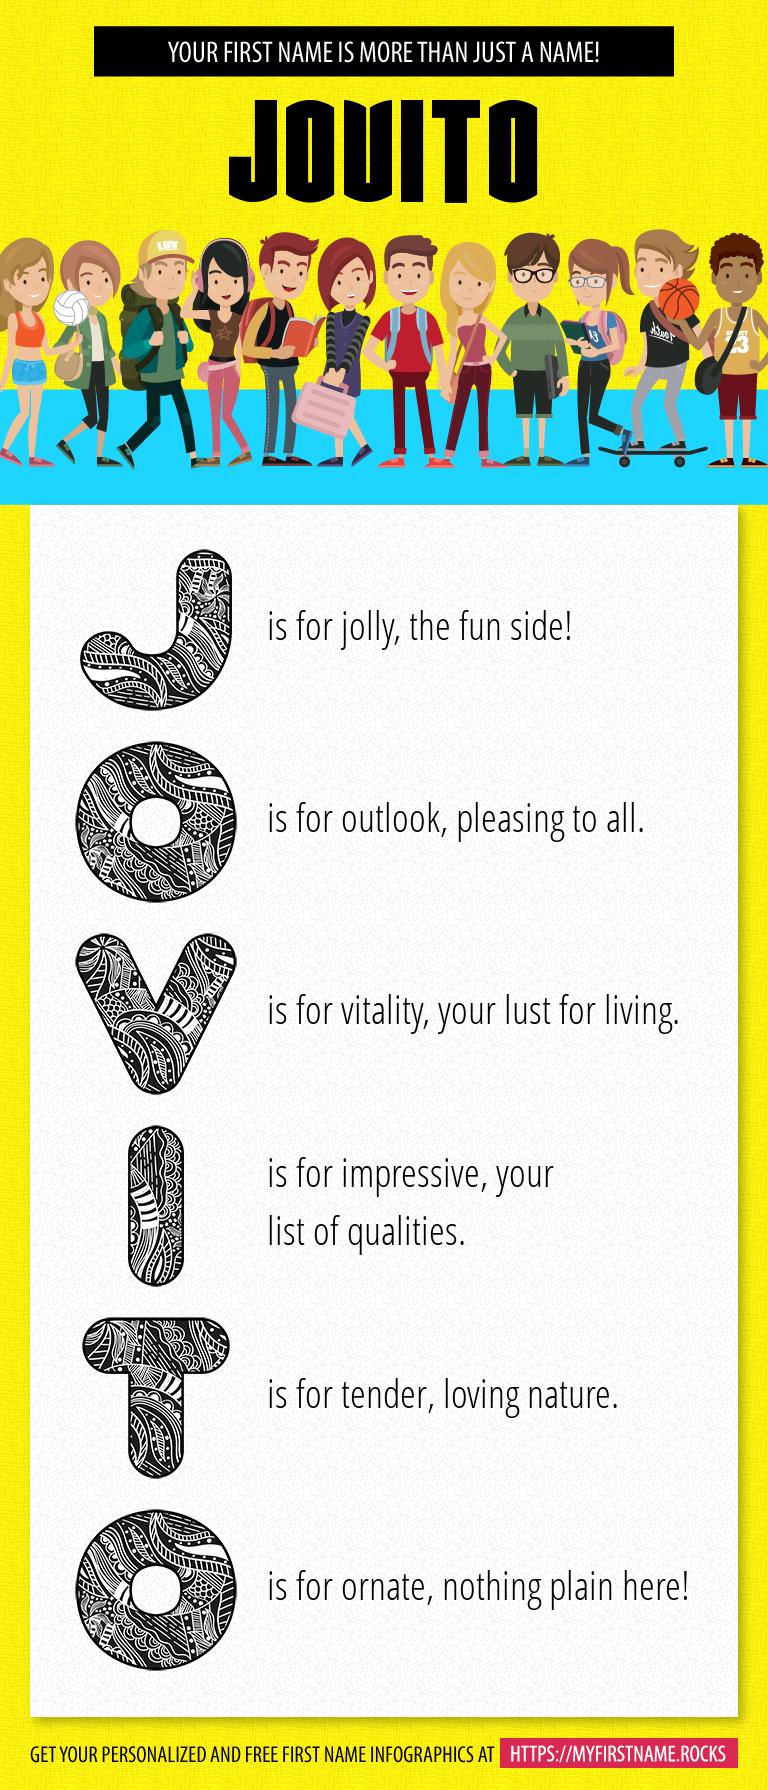 Jovito Infographics